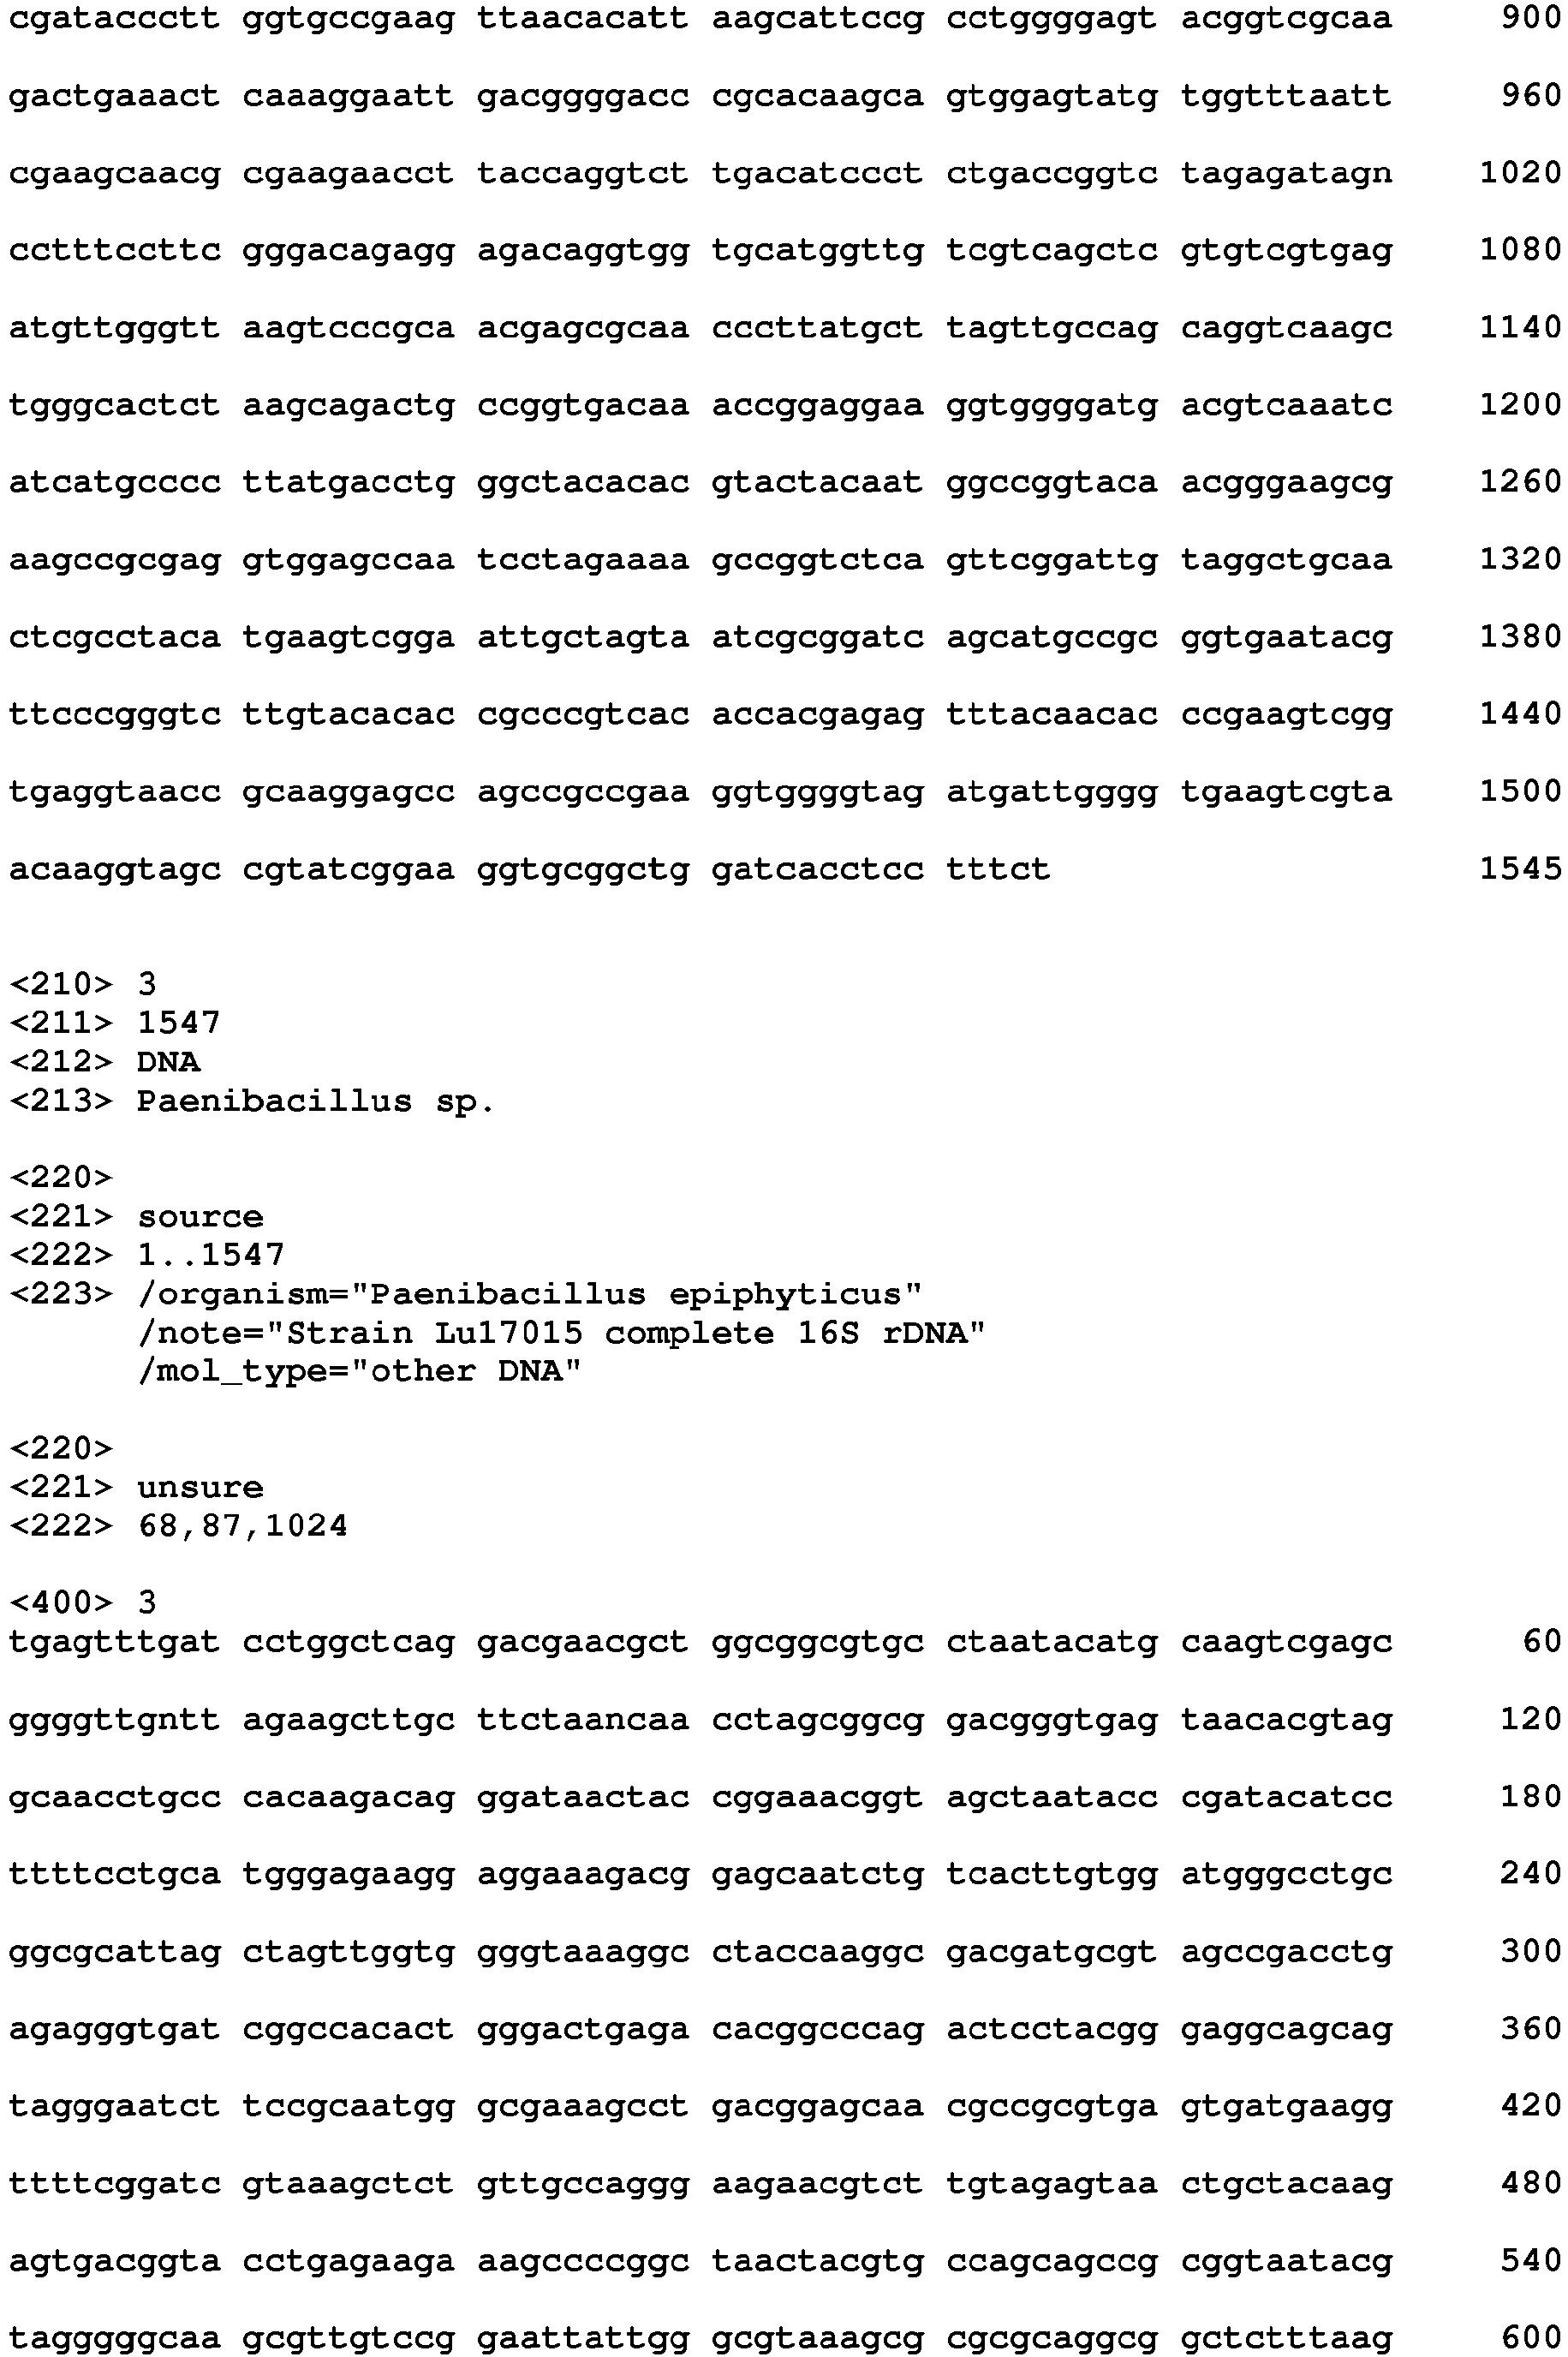 EP3205209A1 - Mixtures and compositions comprising paenibacillus